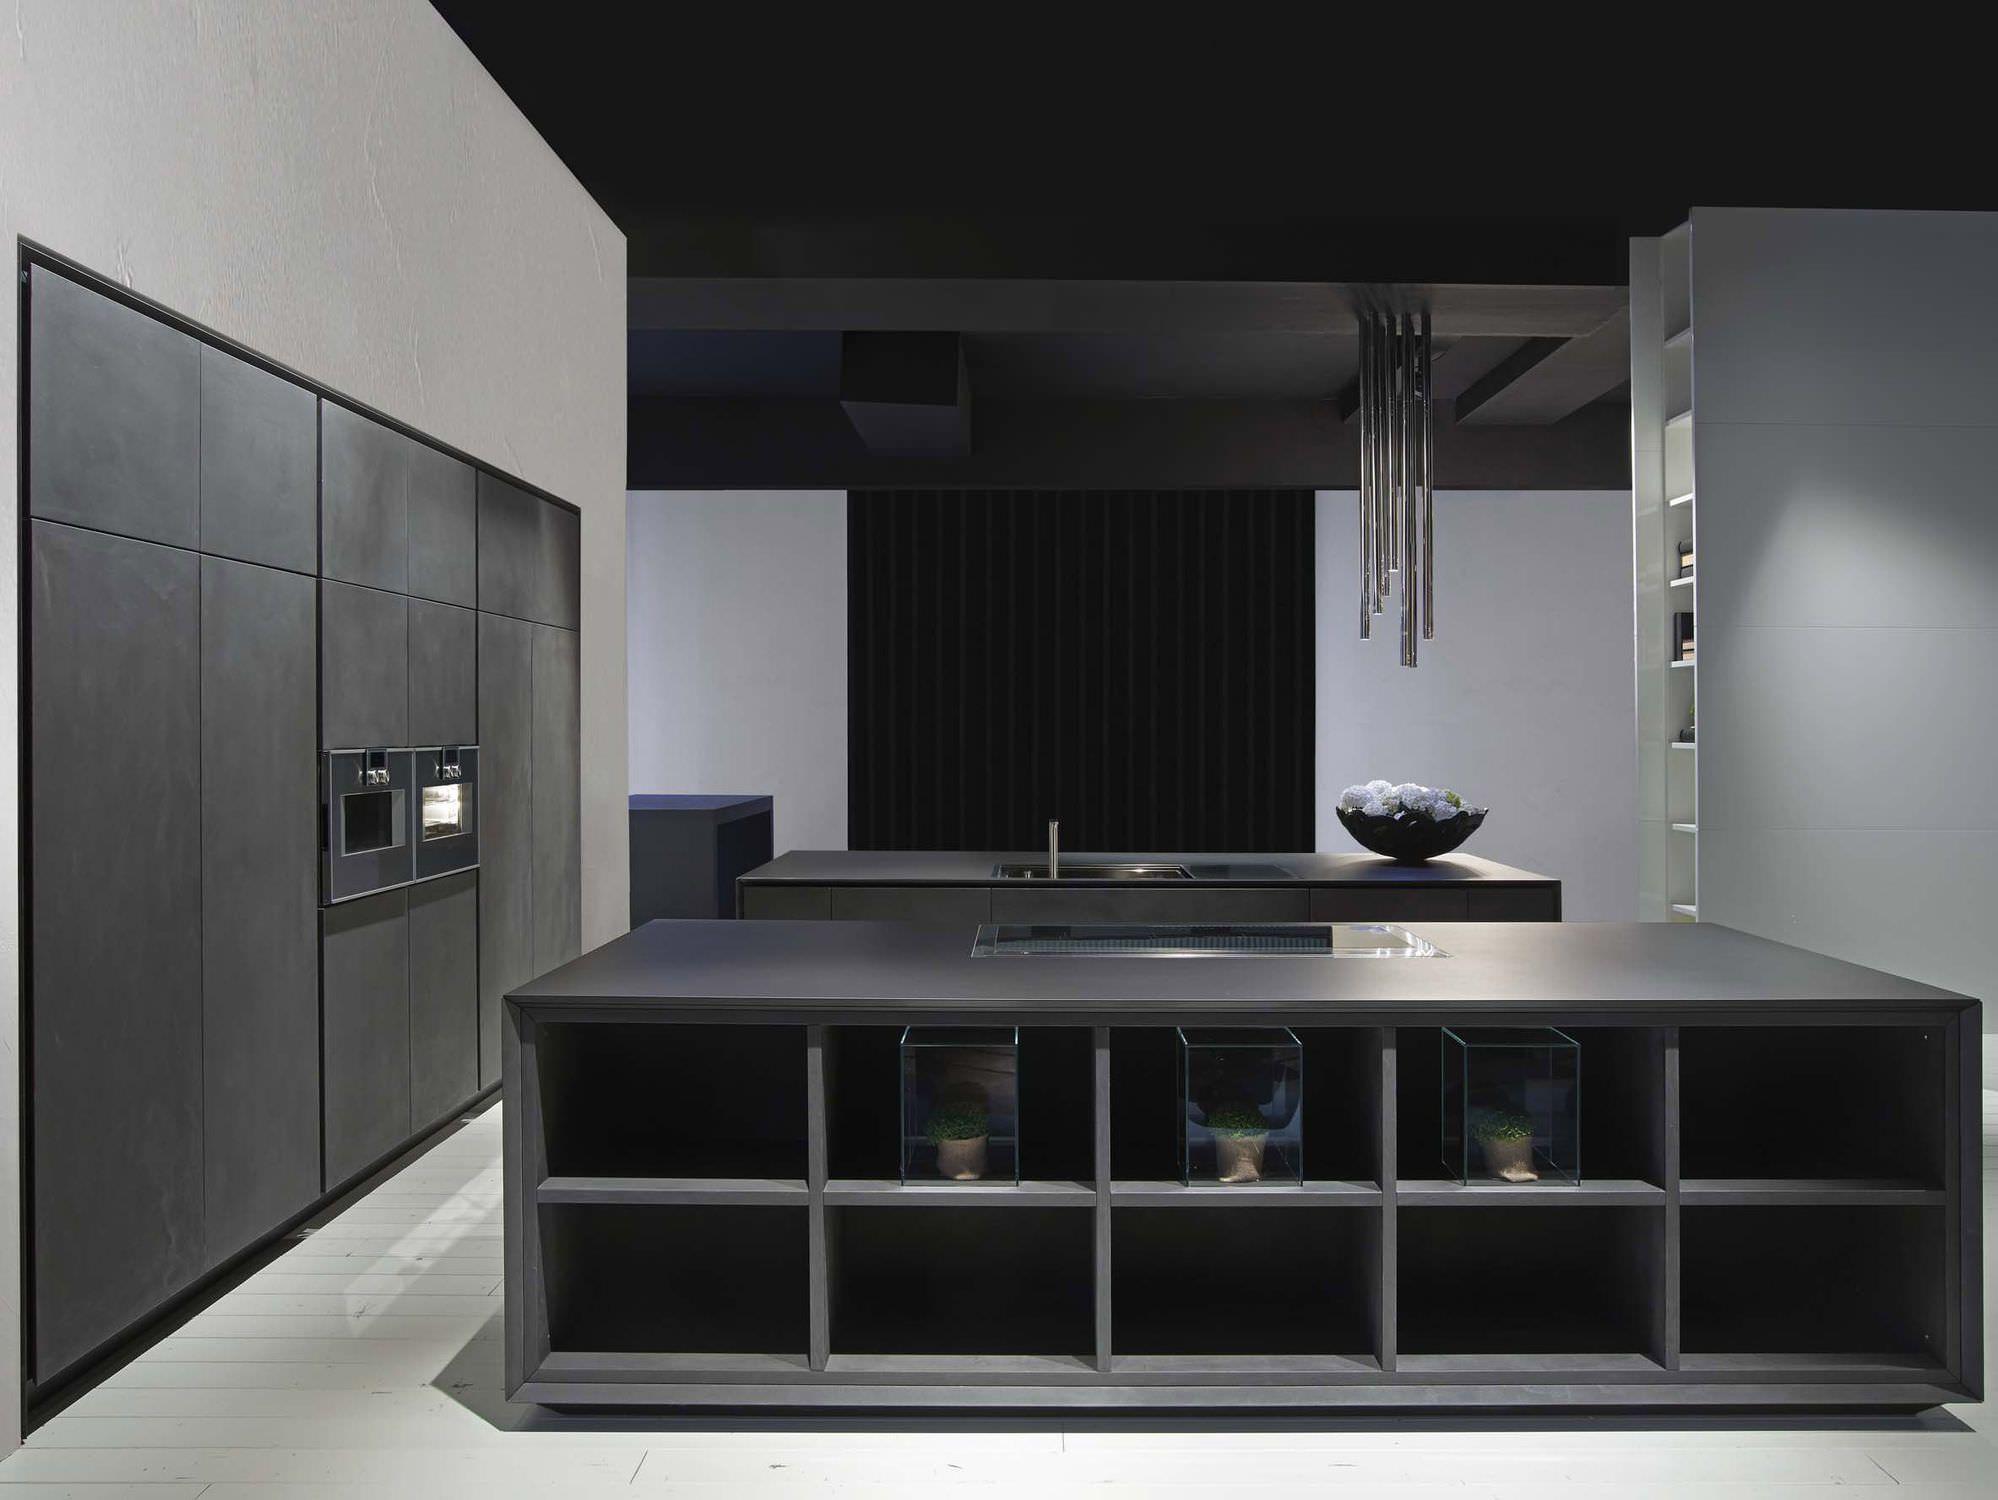 Meuble bas de cuisine / à poser ONE RI.FRA MOBILI | Loft | Pinterest ...